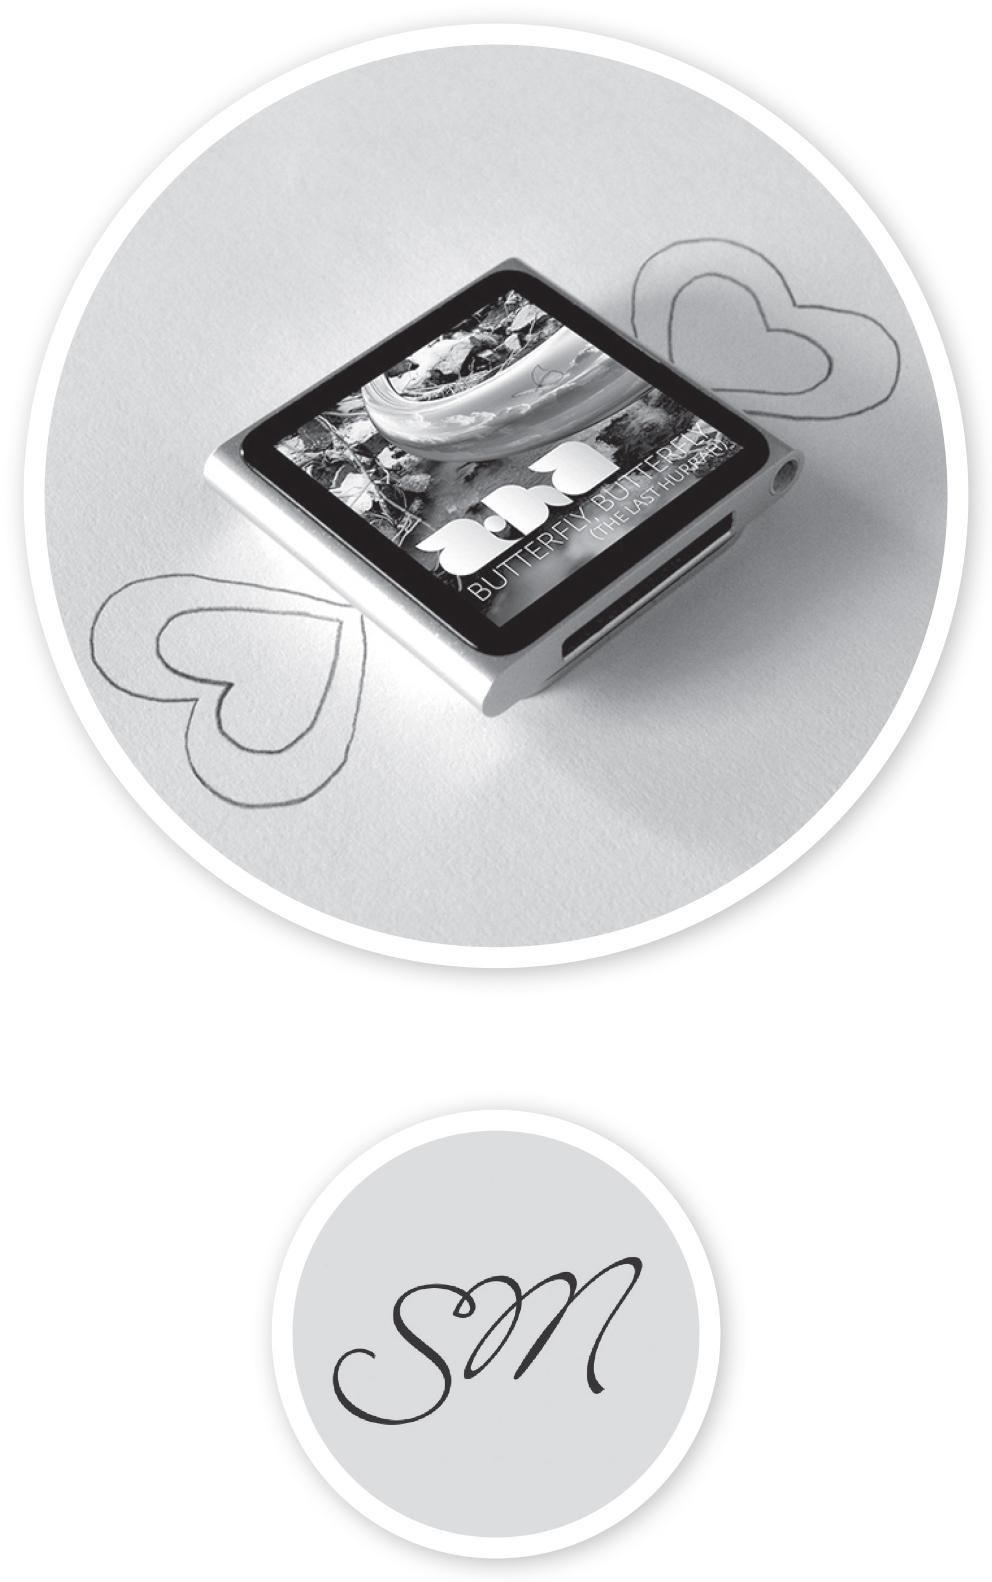 Runde profilbilder design